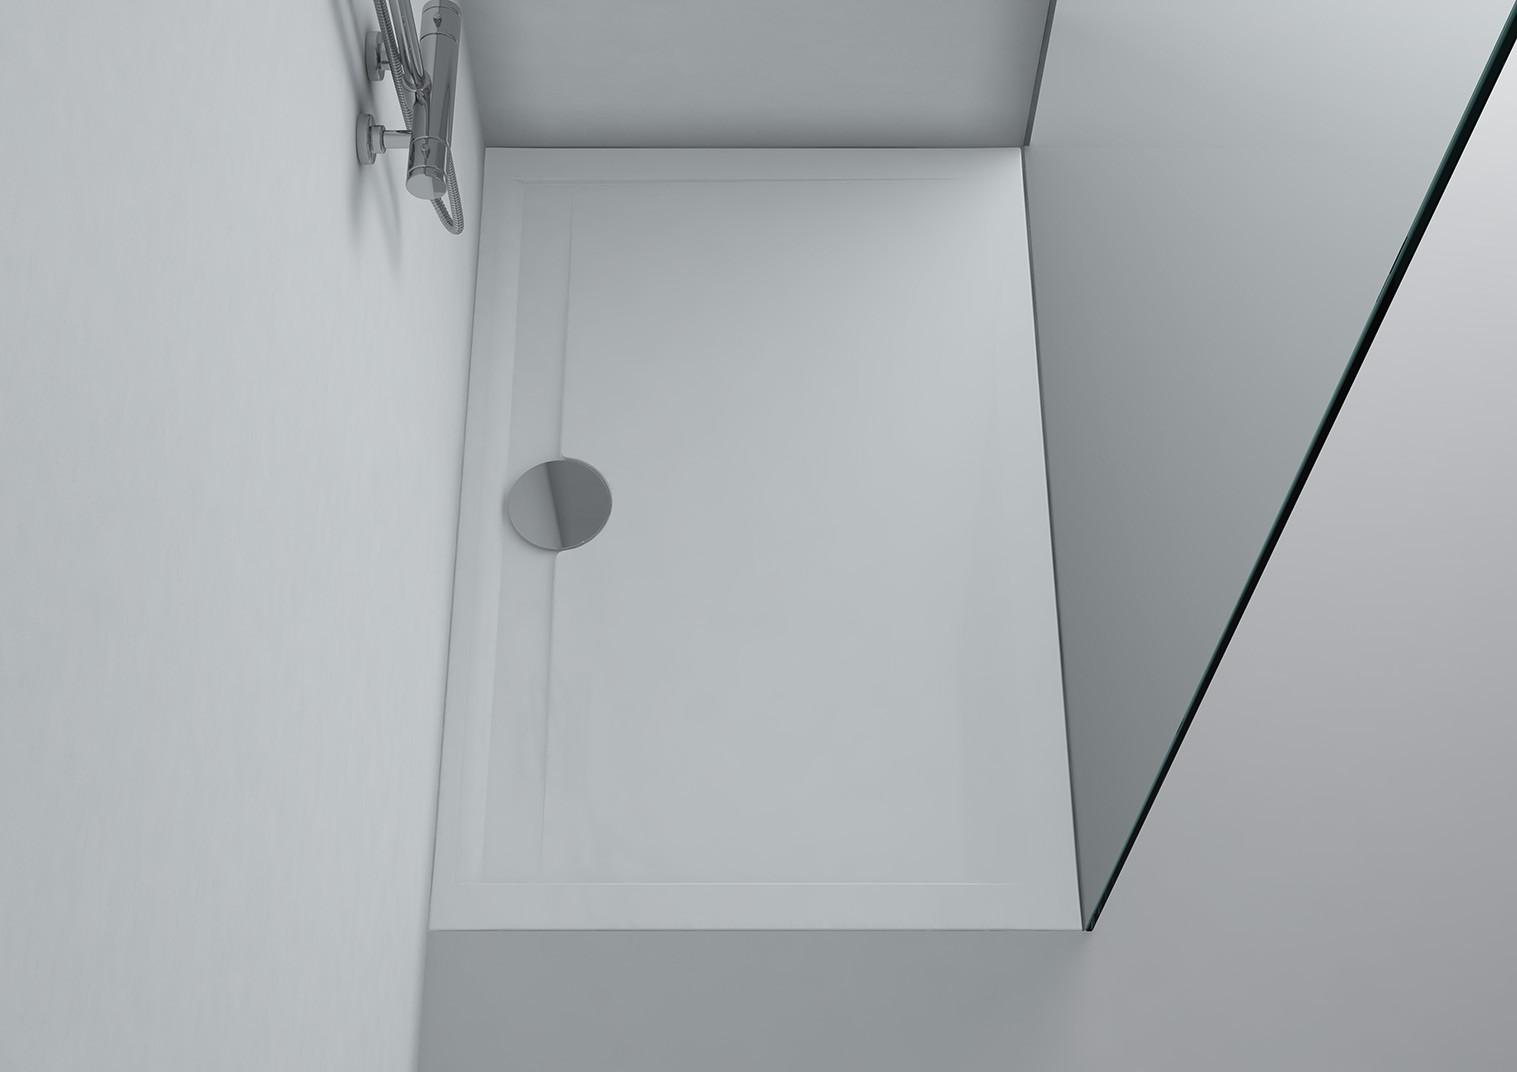 duschwanne 120 x 80 x 3 cm messina mineralguss duschtasse flach bodengleich inkl ablaufgarnitur. Black Bedroom Furniture Sets. Home Design Ideas